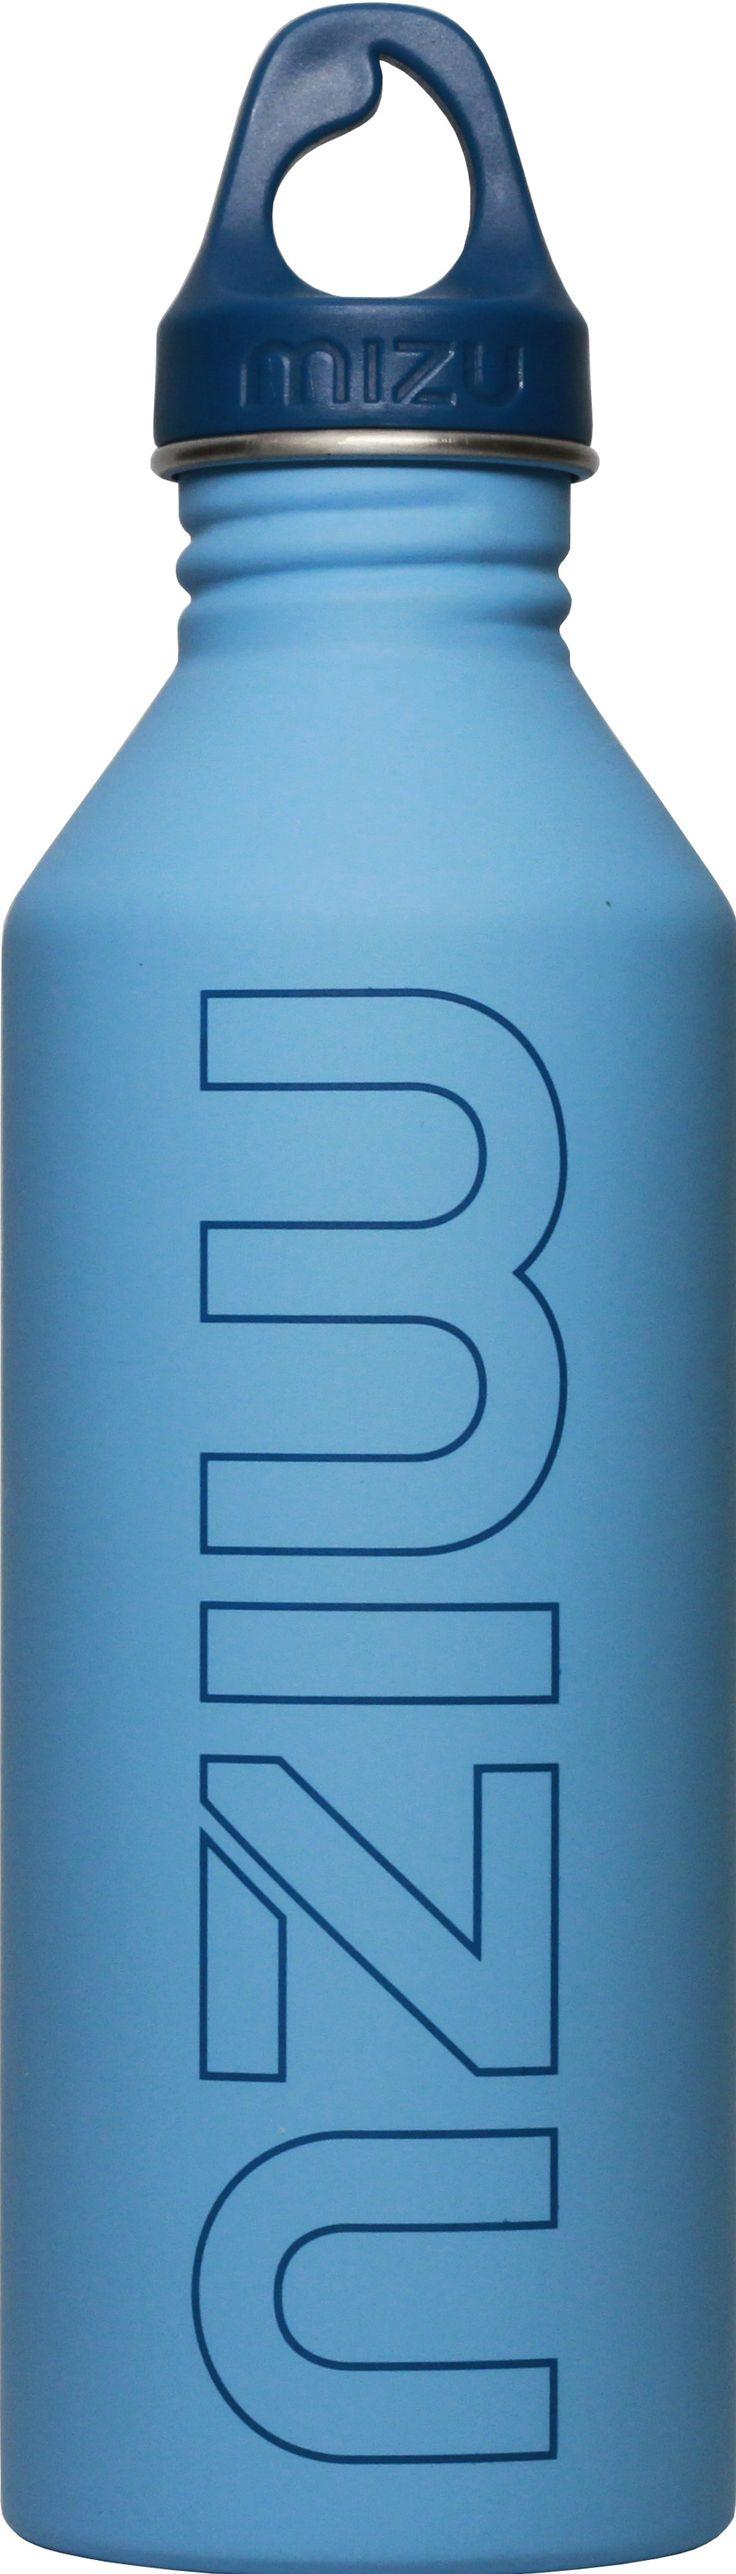 Mizu bottle light blue